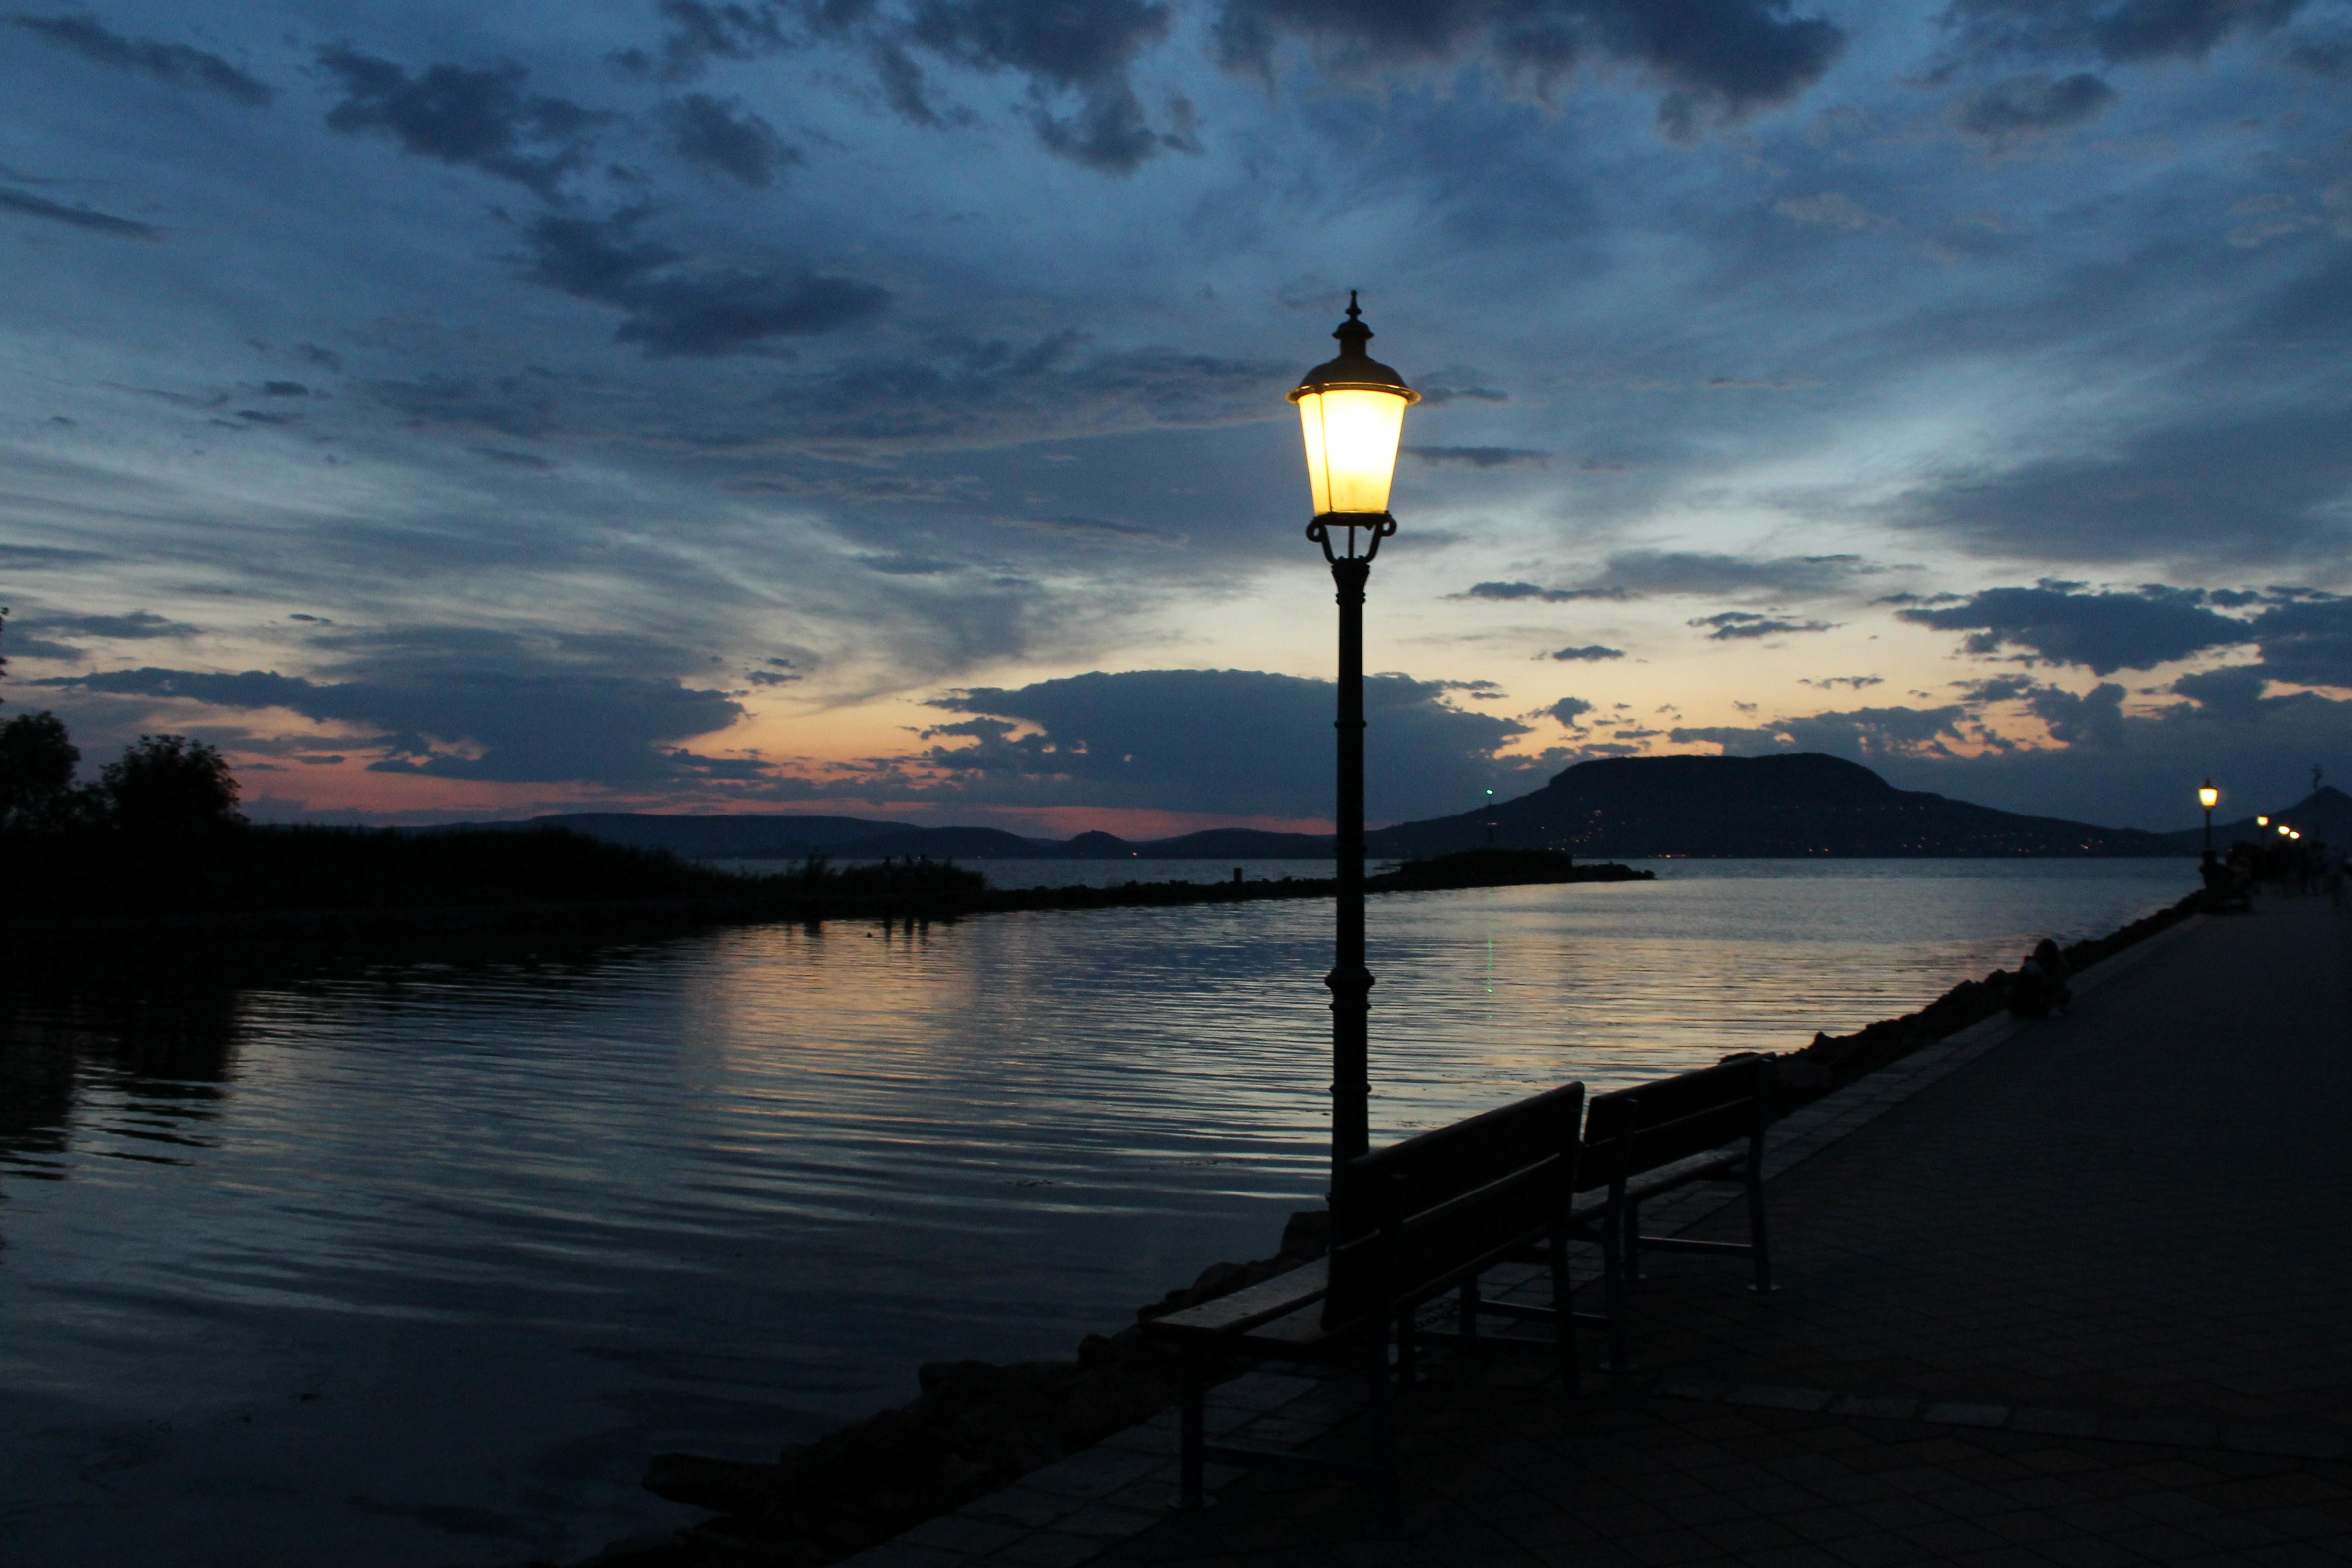 Immagini belle balaton notte cielo lampada lago ungheria